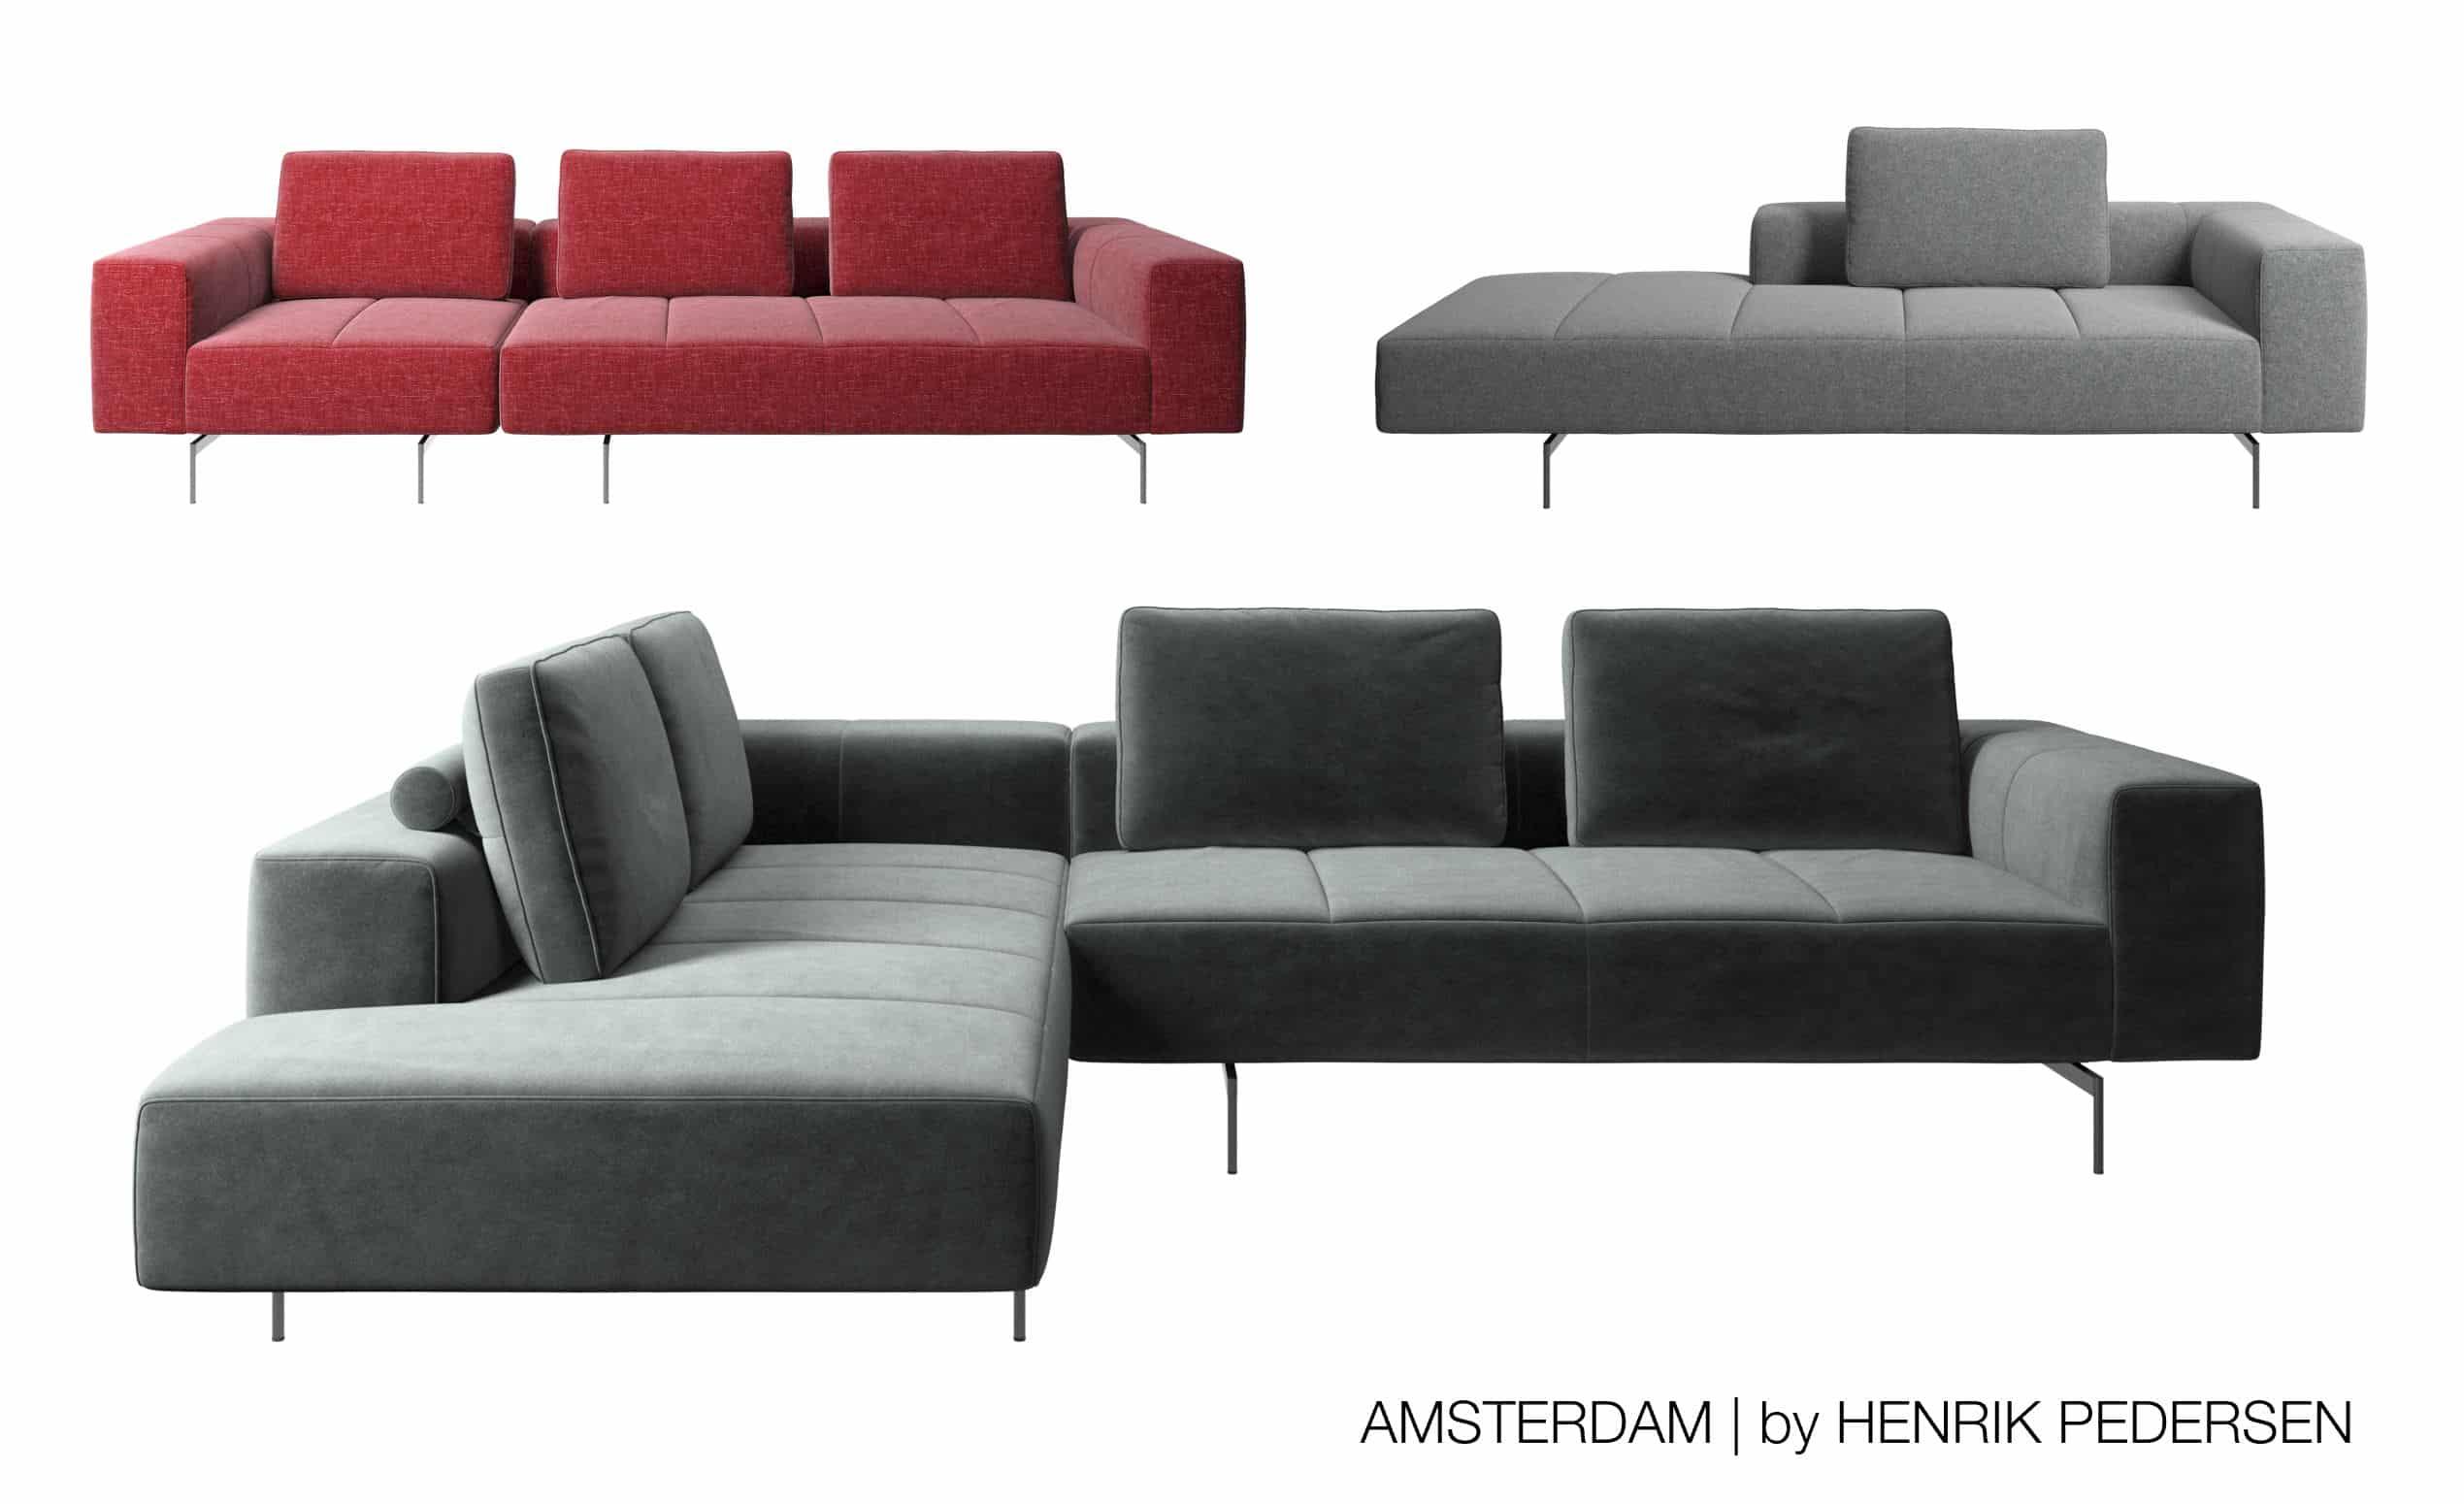 Full Size of Amsterdam Sofa By Henrik Pedersen Boconcept Experience Grün Billig Breit Big Grau Cassina U Form Garten Ecksofa Englisches Leder Sofa Sofa Hannover